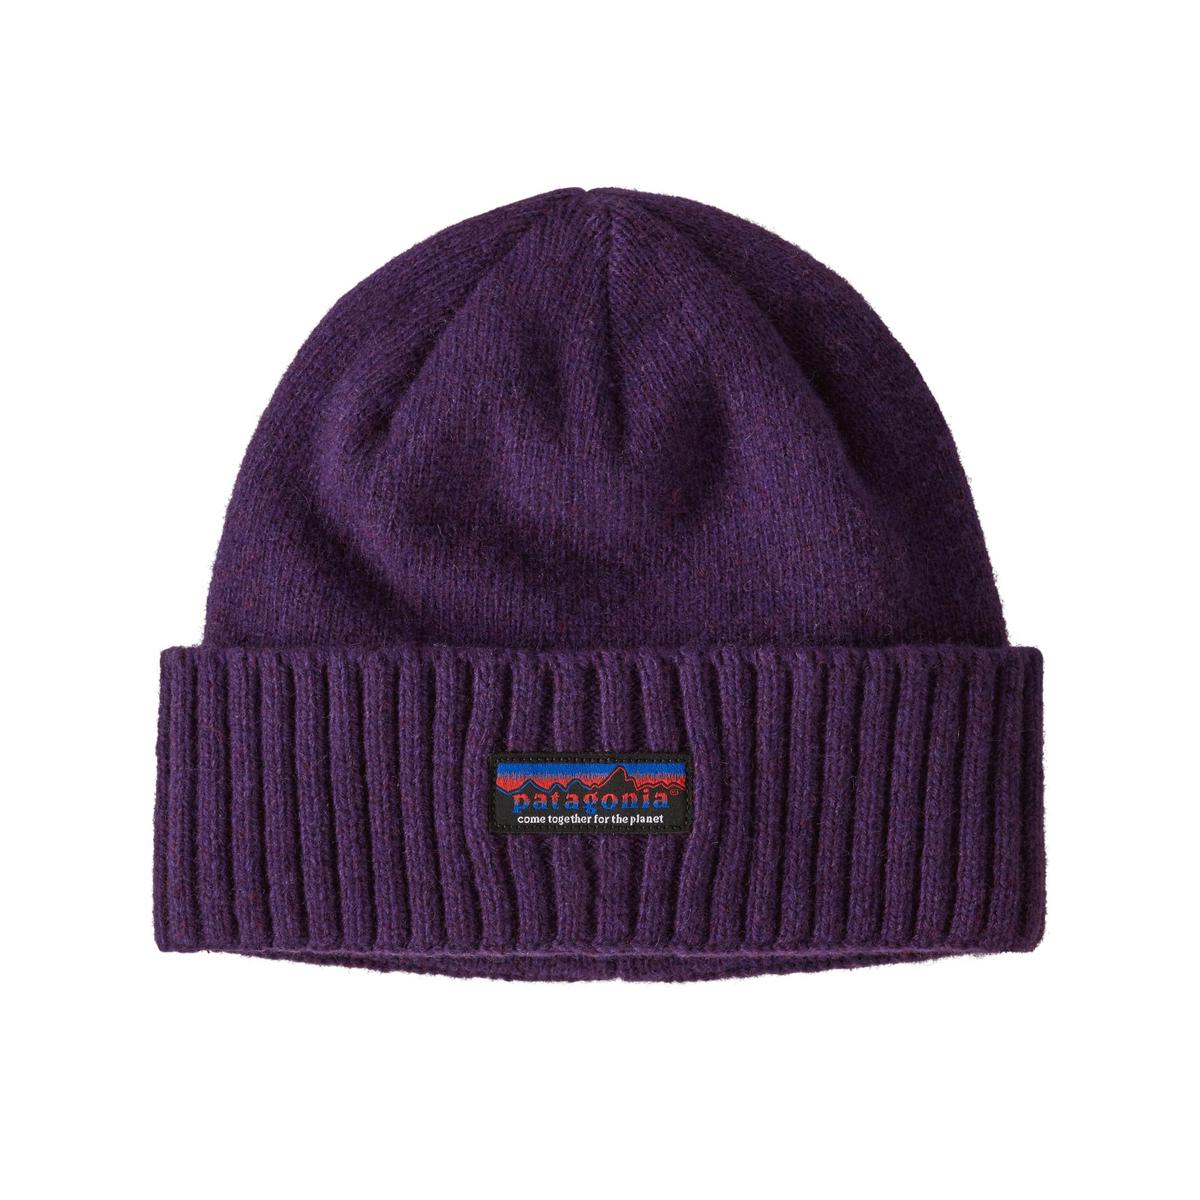 Patagonia Unisex Patagonia Brodeo Beanie - Purple